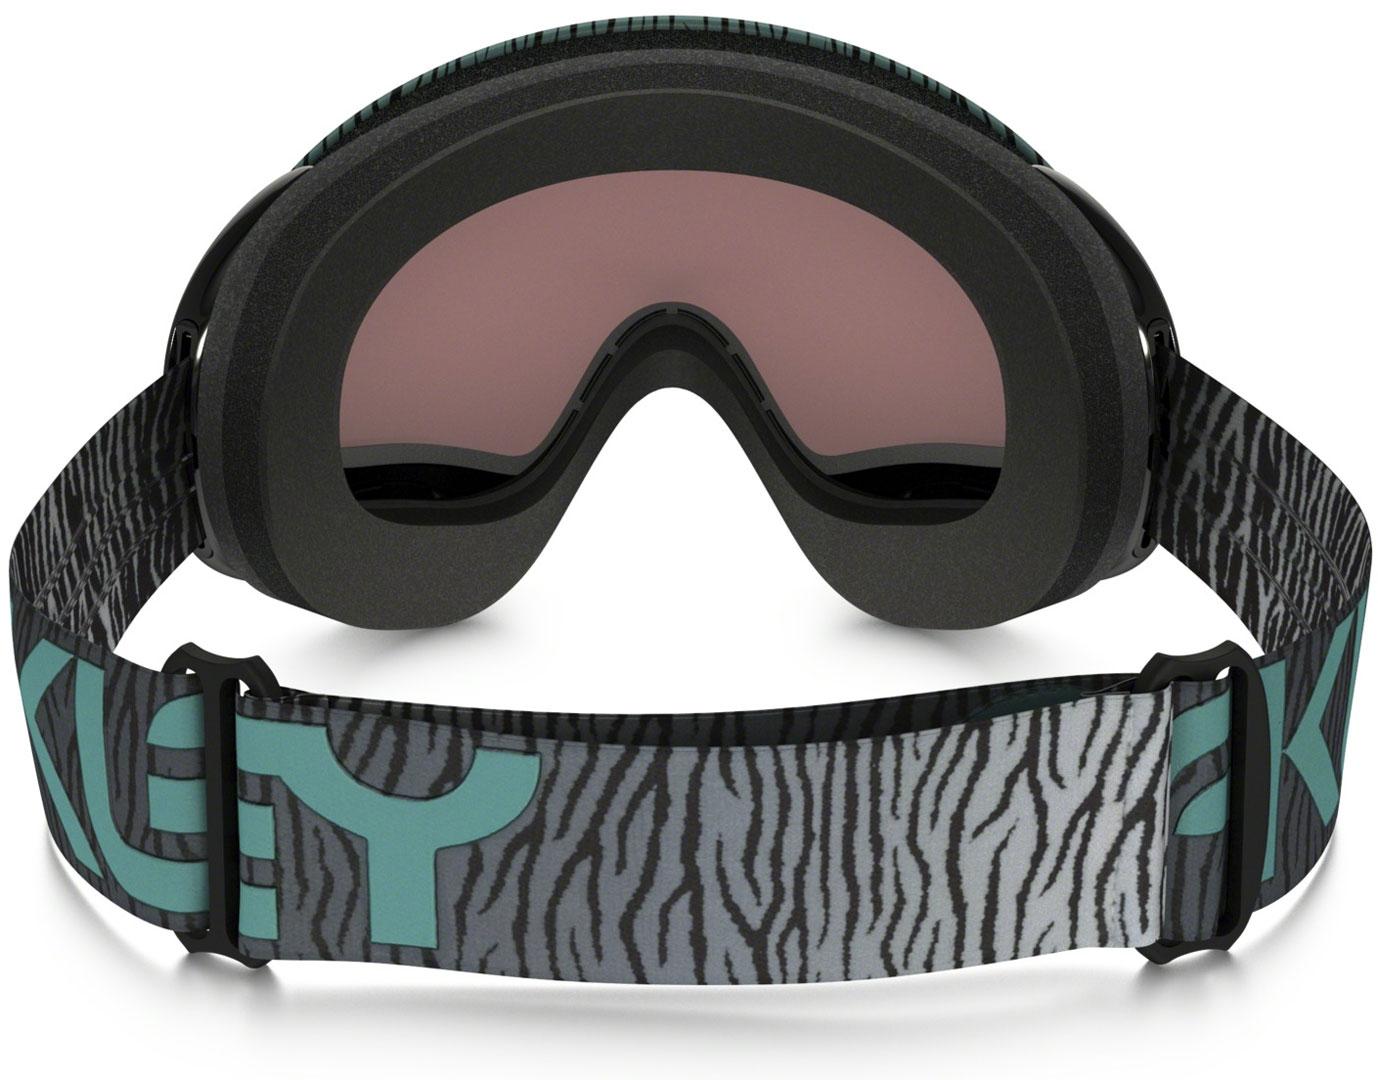 new oakley goggles 2016 pje4  OAKLEY A-FRAME 20 Goggle 2016 factory pilot bengal mint/prizm black iridium